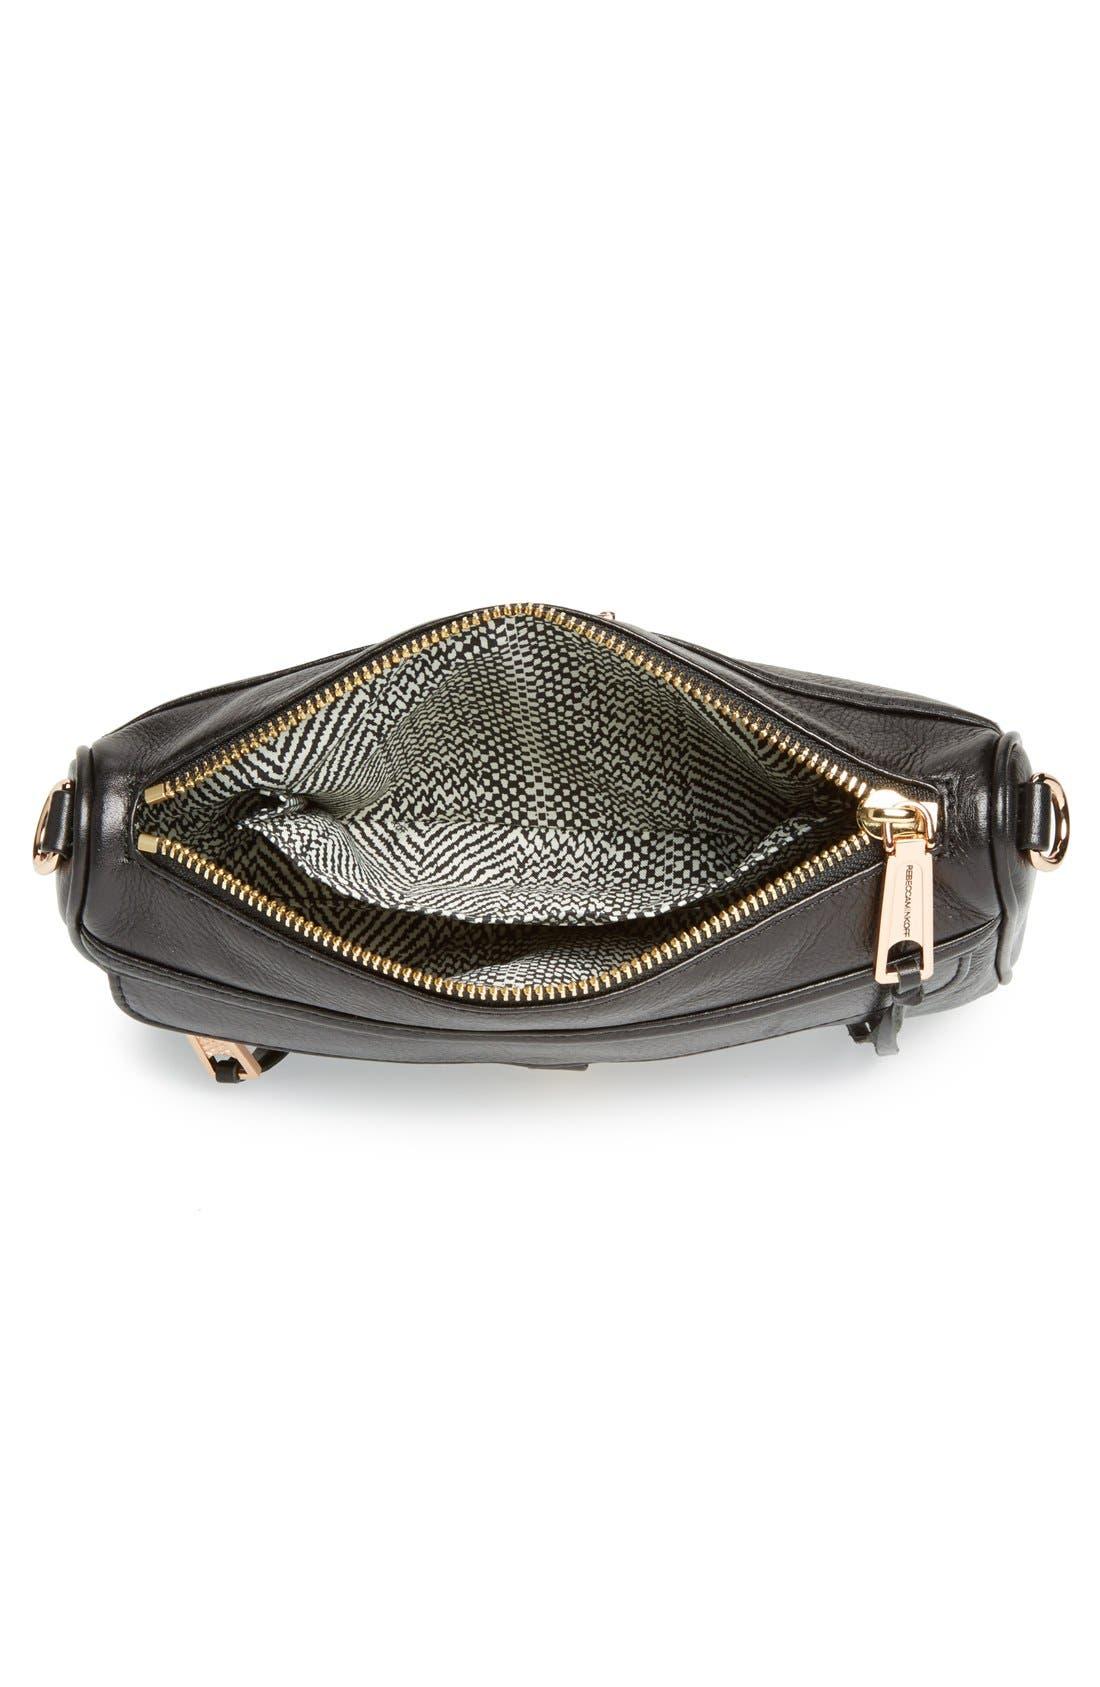 Alternate Image 3  - Rebecca Minkoff 'Quilted Mini Affair' Convertible Crossbody Bag